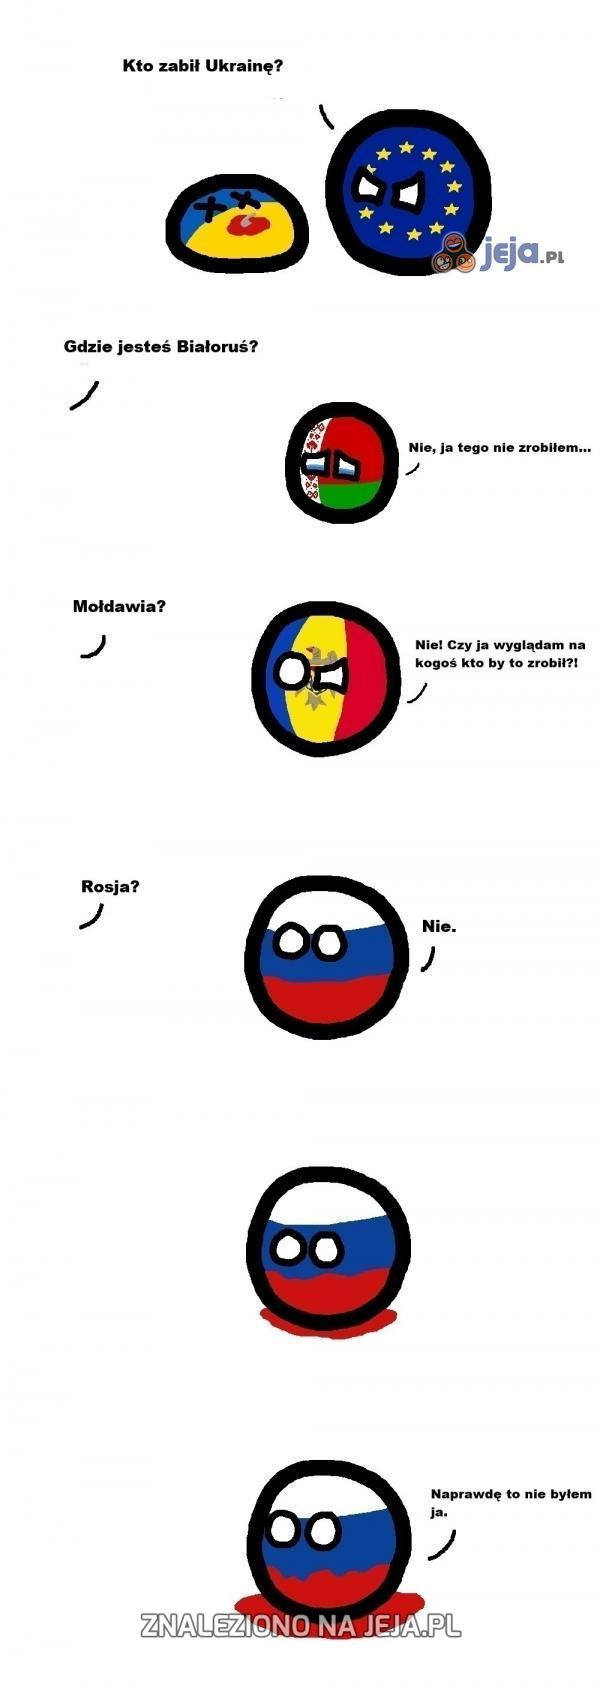 Kto zabił Ukrainę?